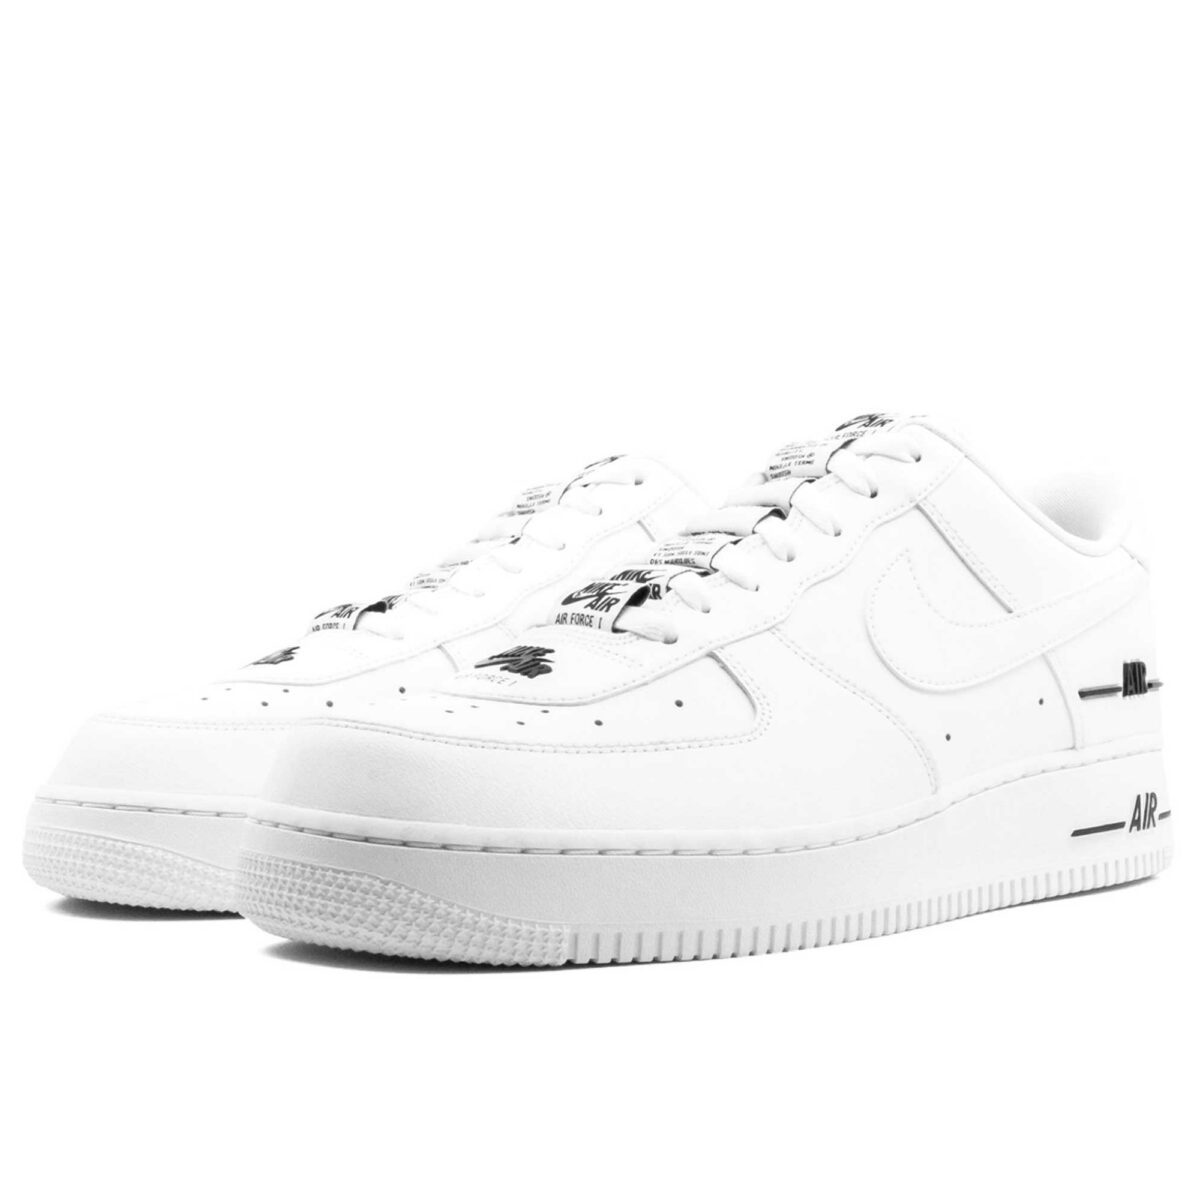 nike air force 1 07 sneakers CJ379_100 купить